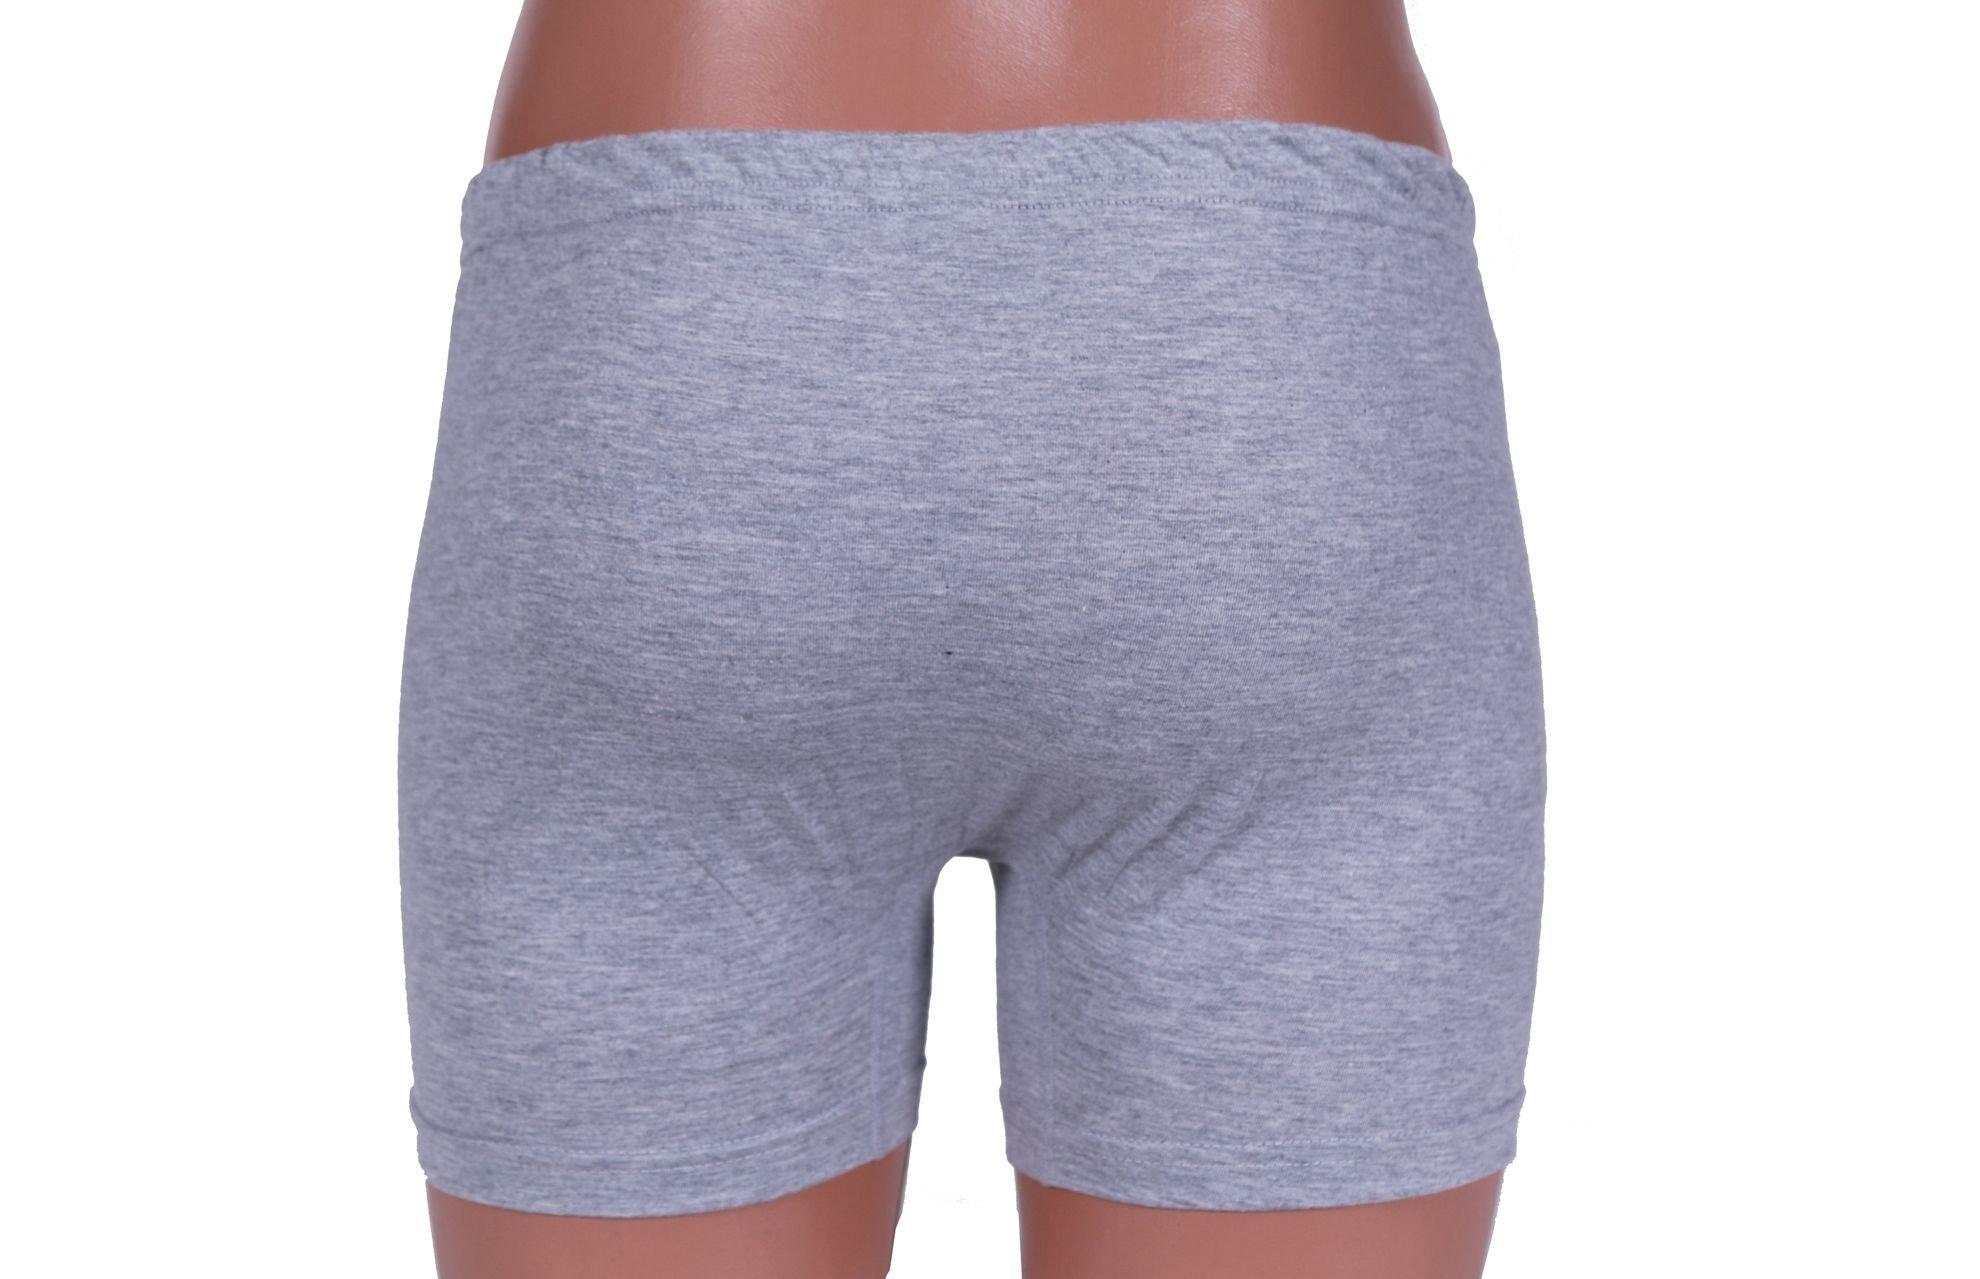 Трусы-шорты для мужчин (Арт. TOR 1884)